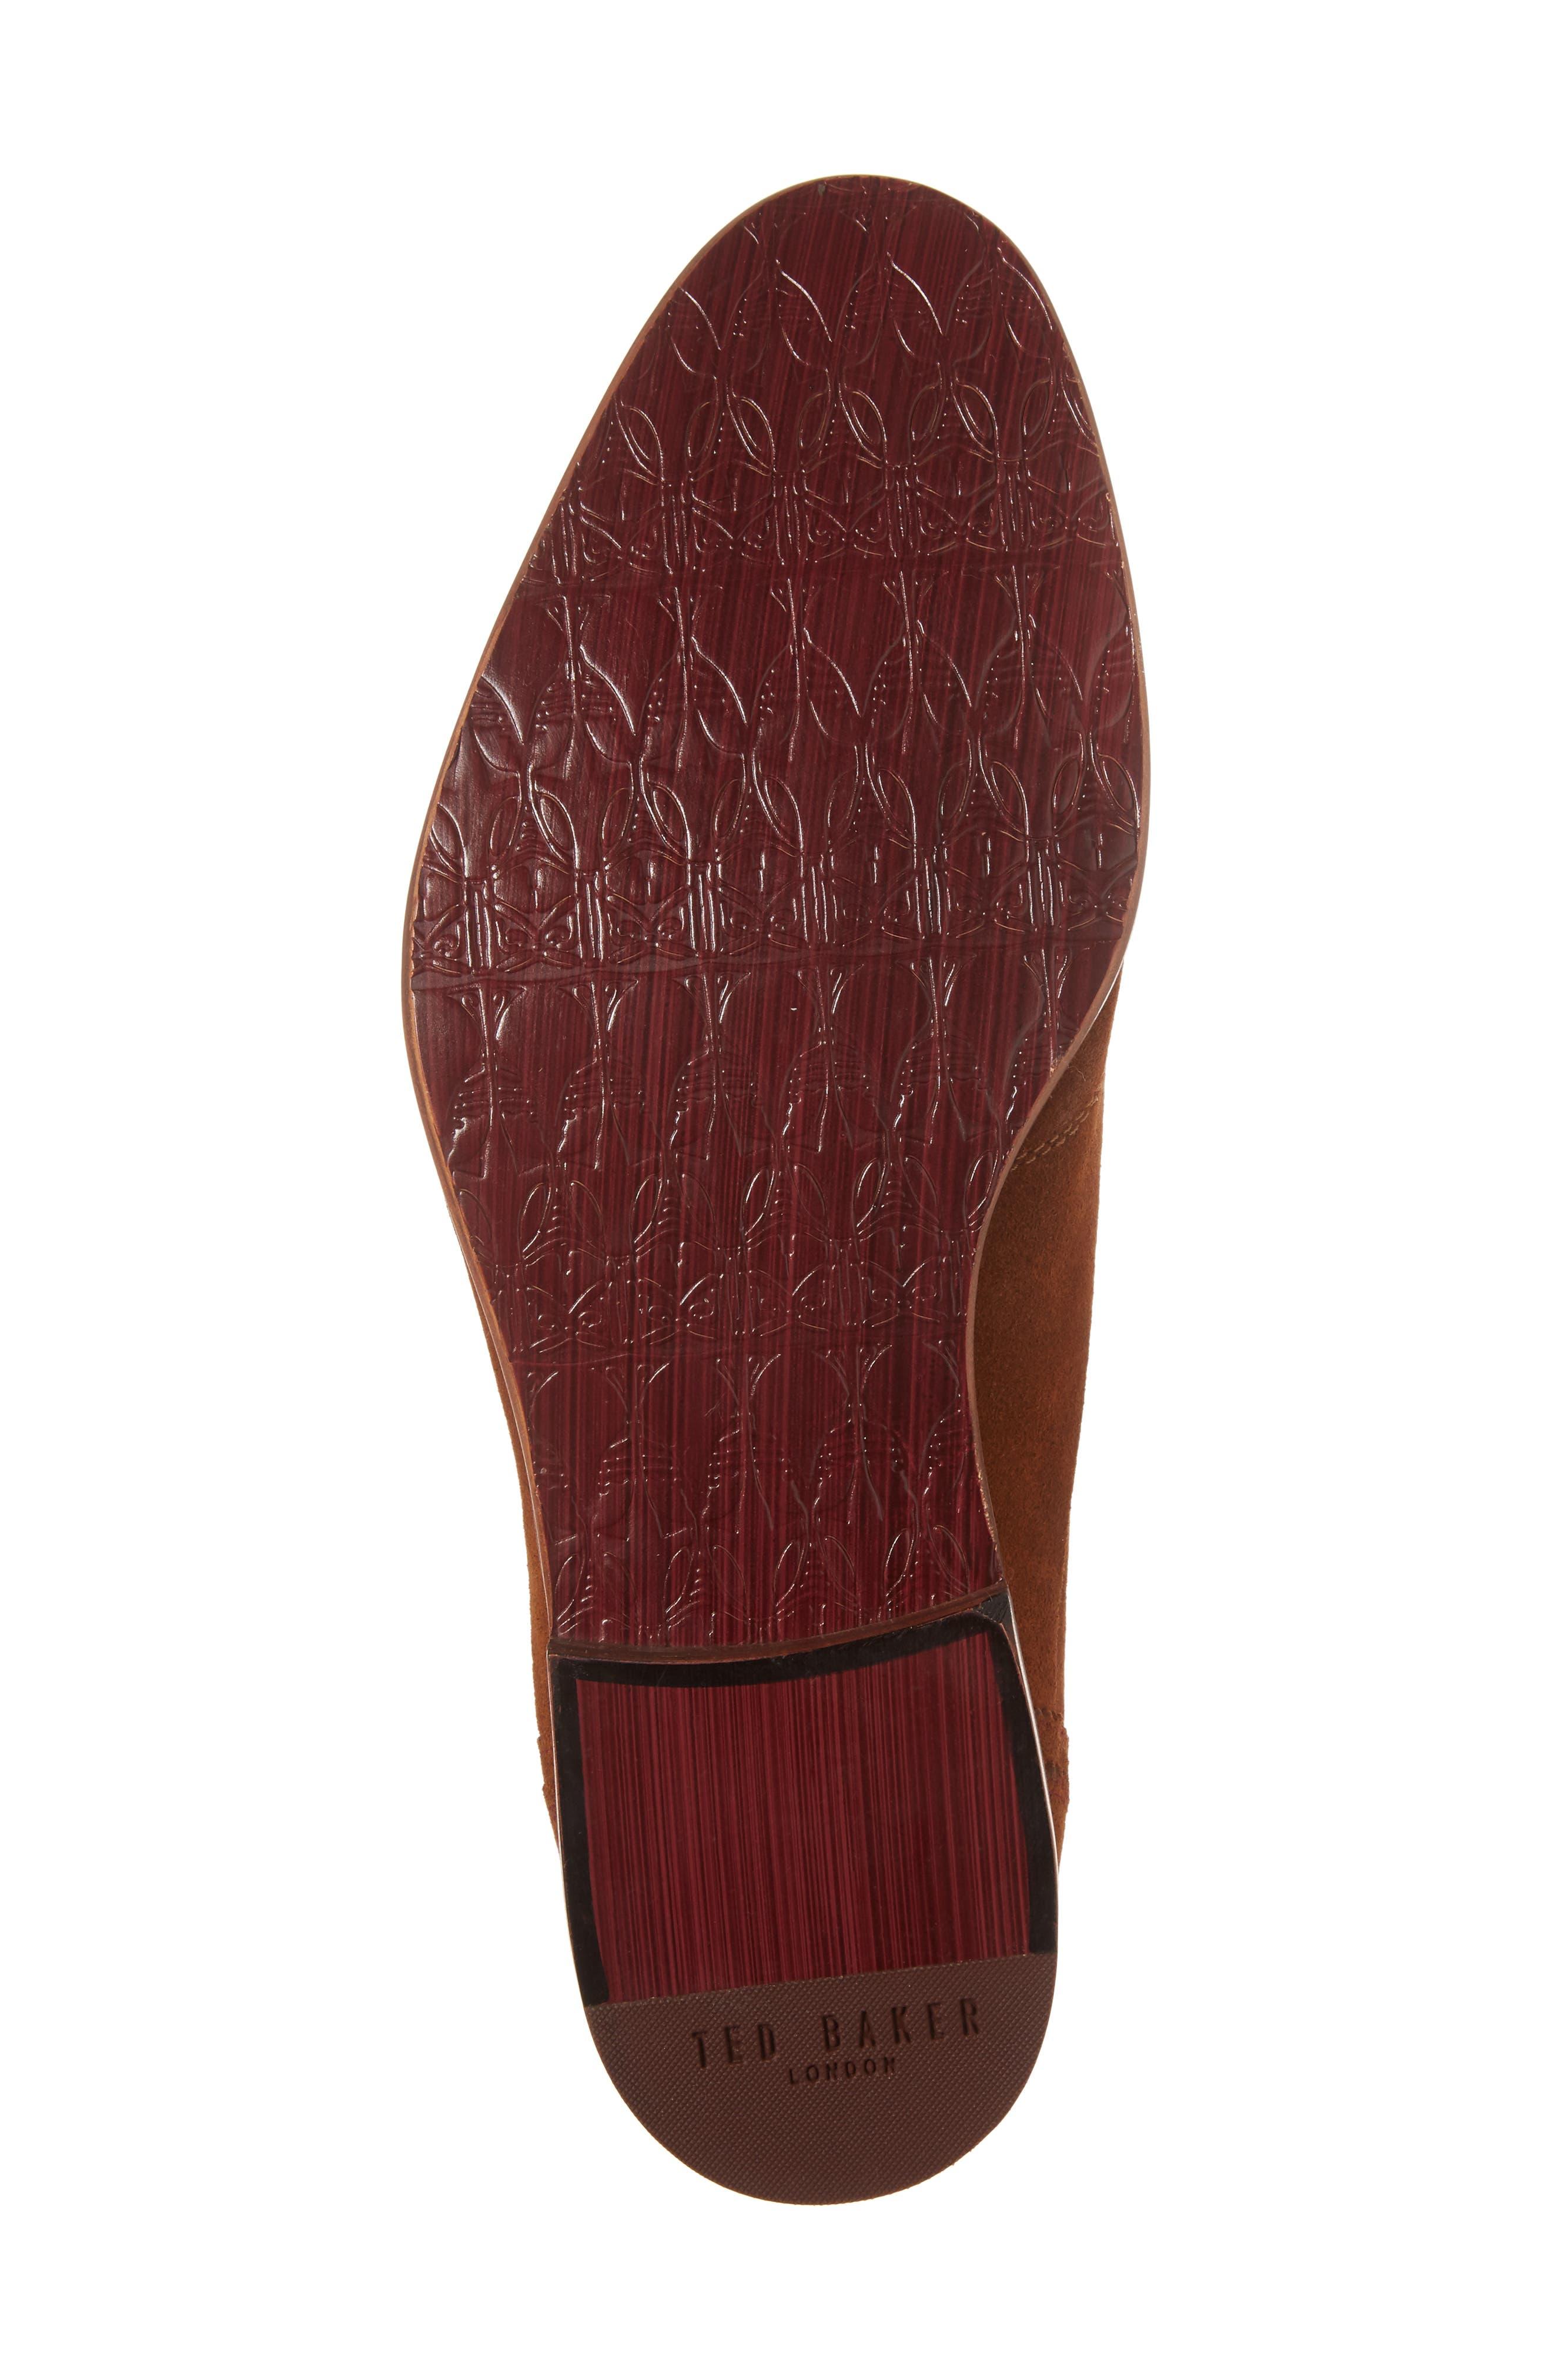 Rovere Wingtip Monk Shoe,                             Alternate thumbnail 6, color,                             Tan Suede